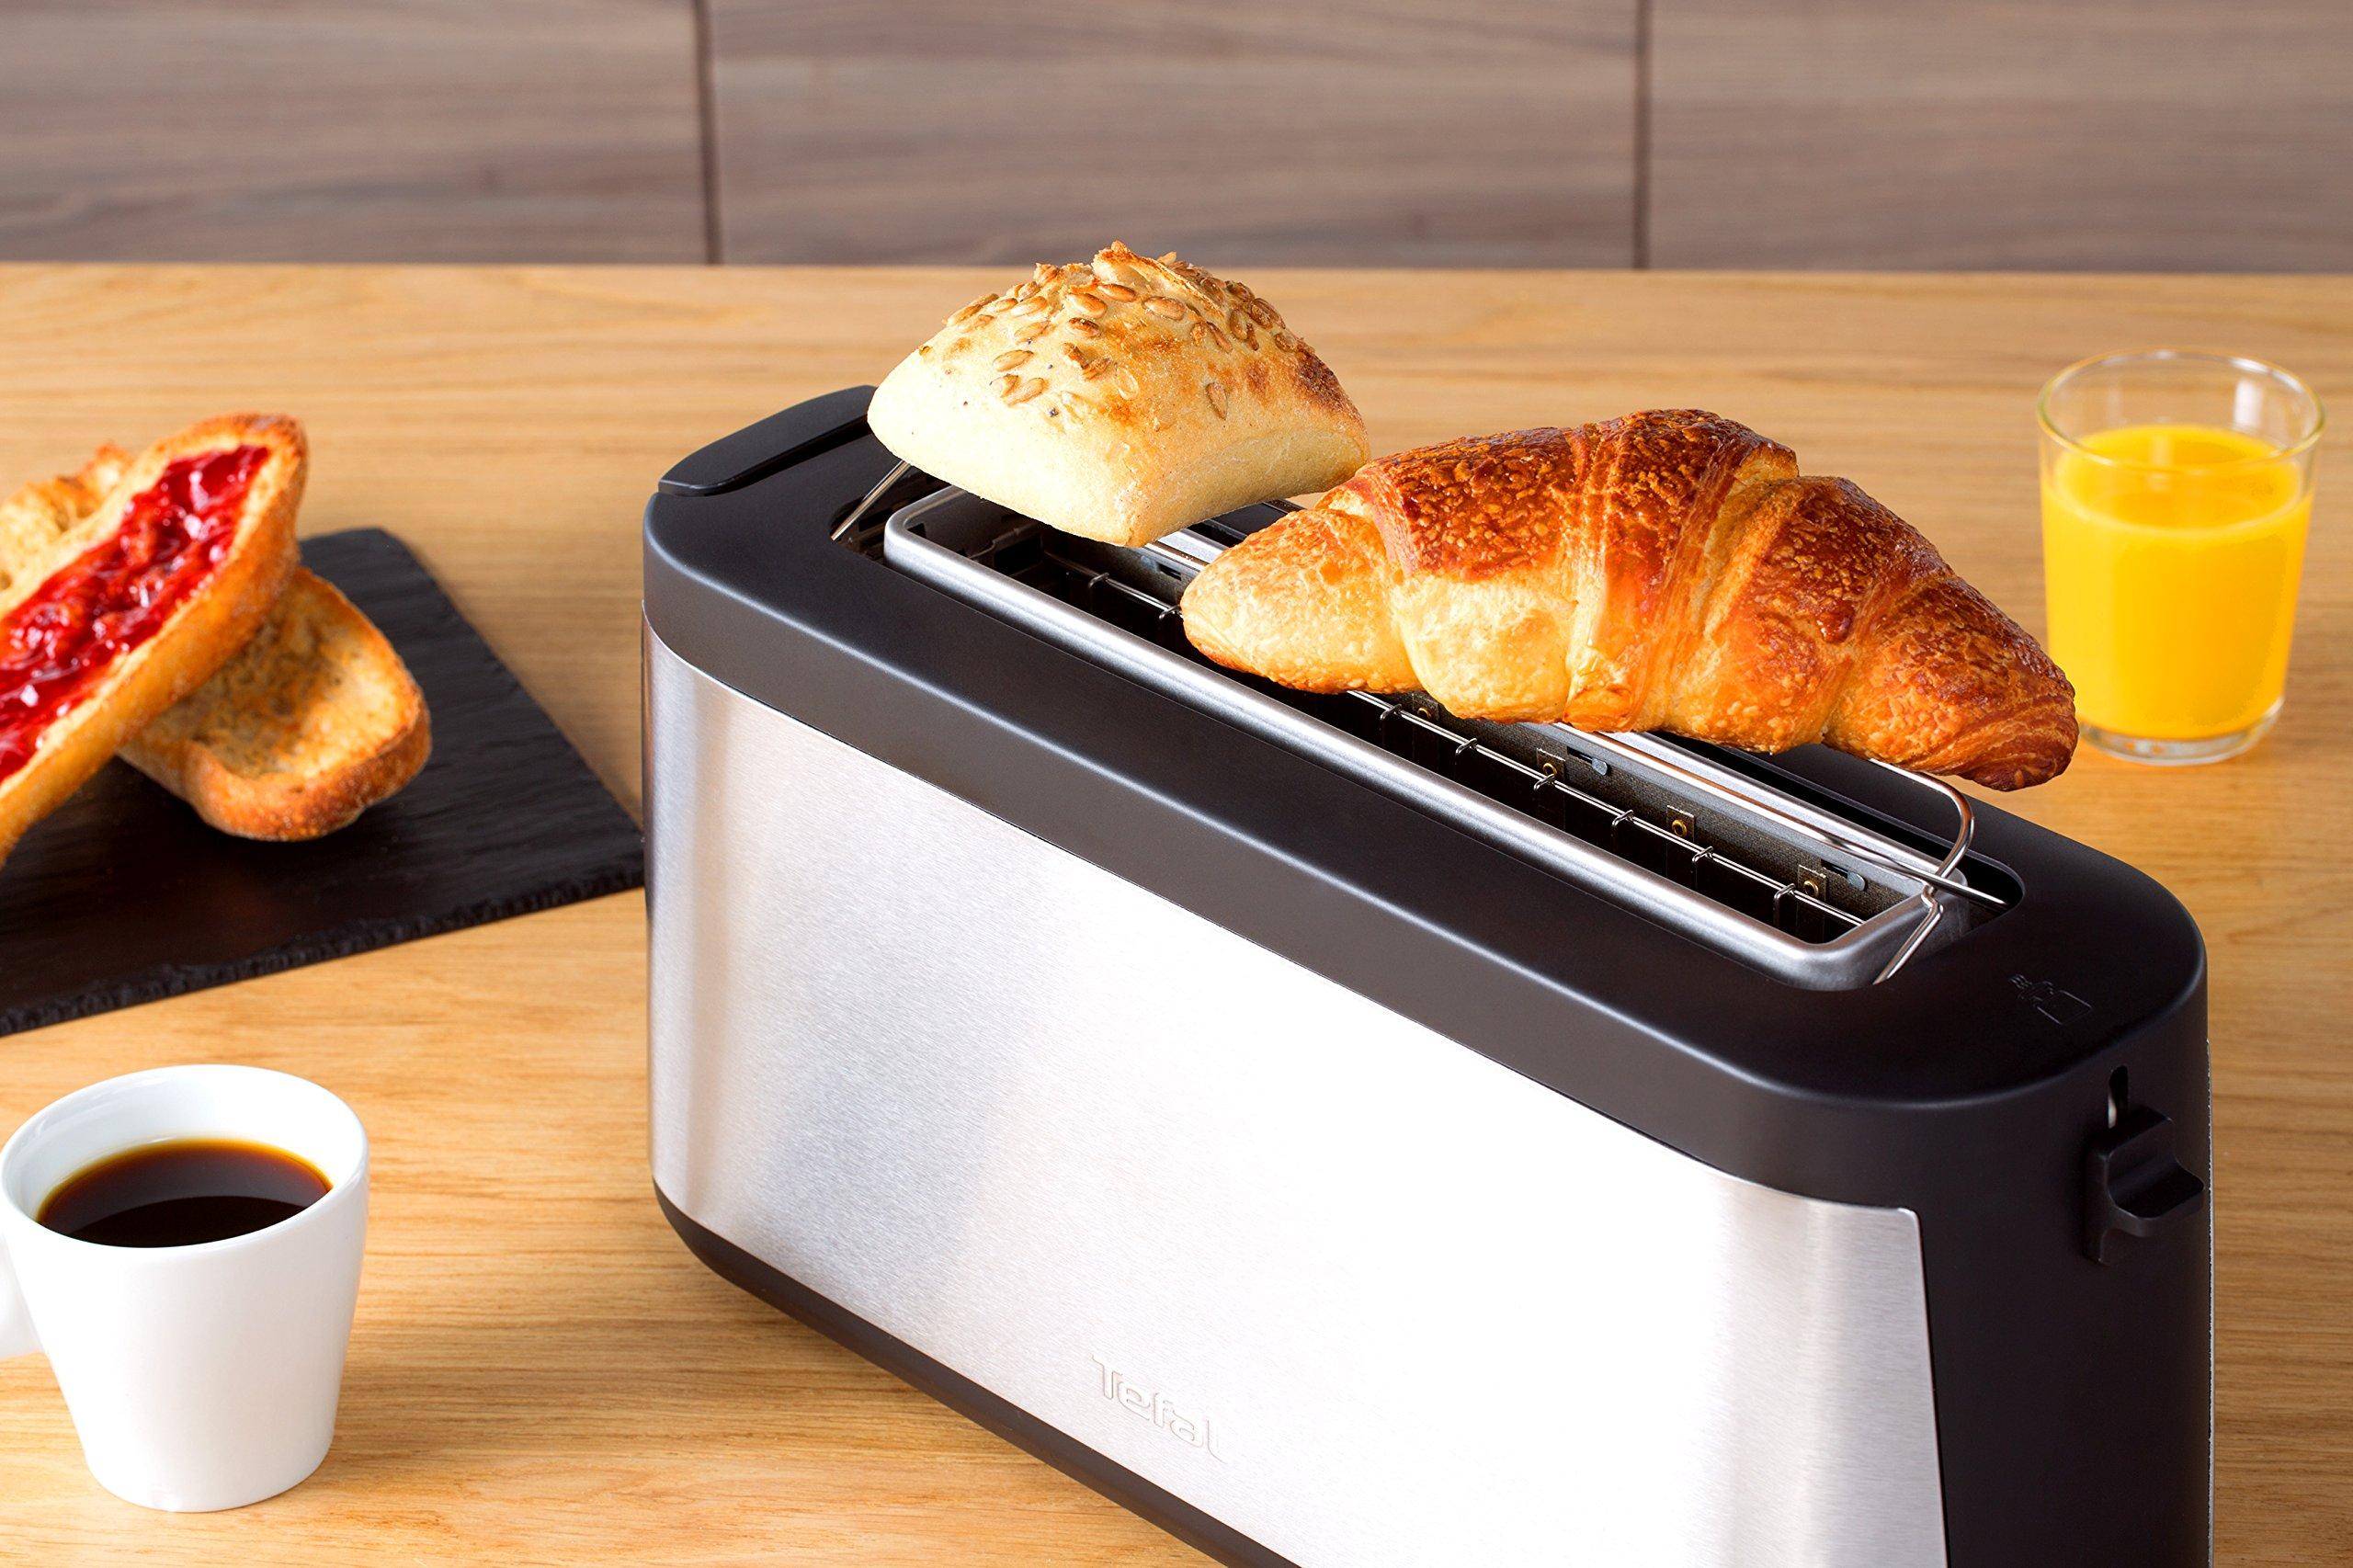 Tefal-Element-TL4308-Toaster-7-Brunungsstufen-1000-Watt-silberschwarz